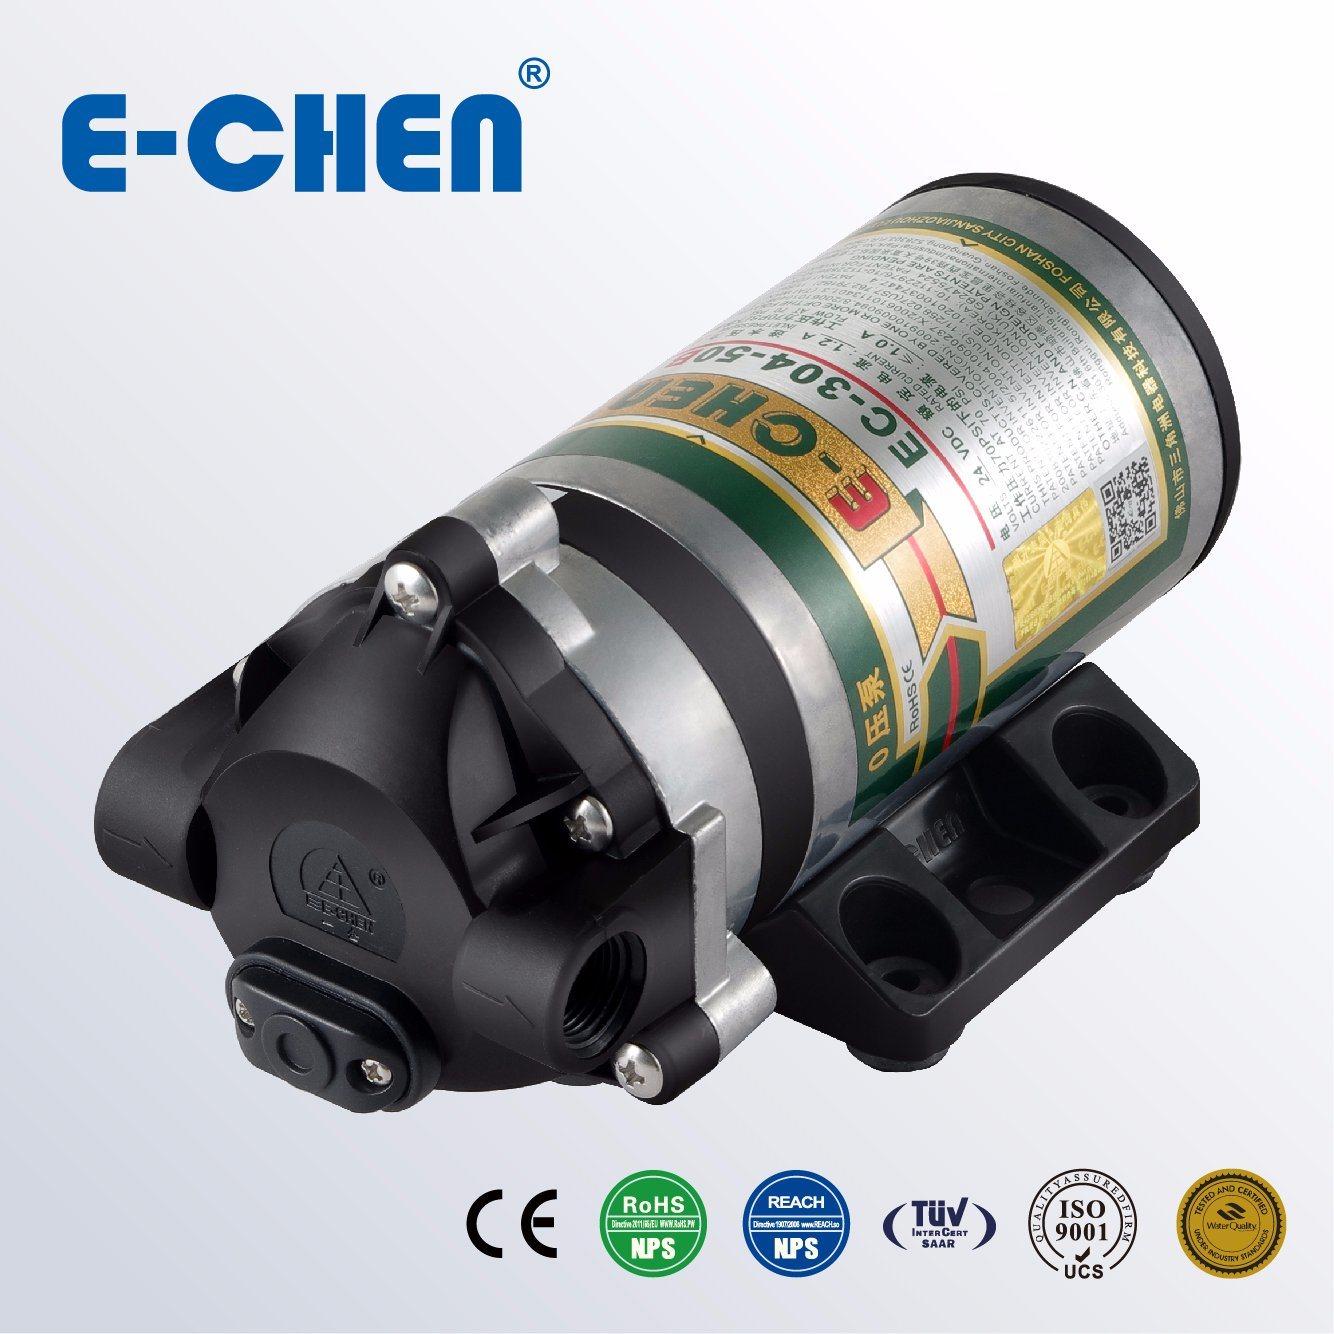 China 100 gpd strong self priming diaphragm pump 304 100b china china 100 gpd strong self priming diaphragm pump 304 100b china water pump diaphragm pump ccuart Images